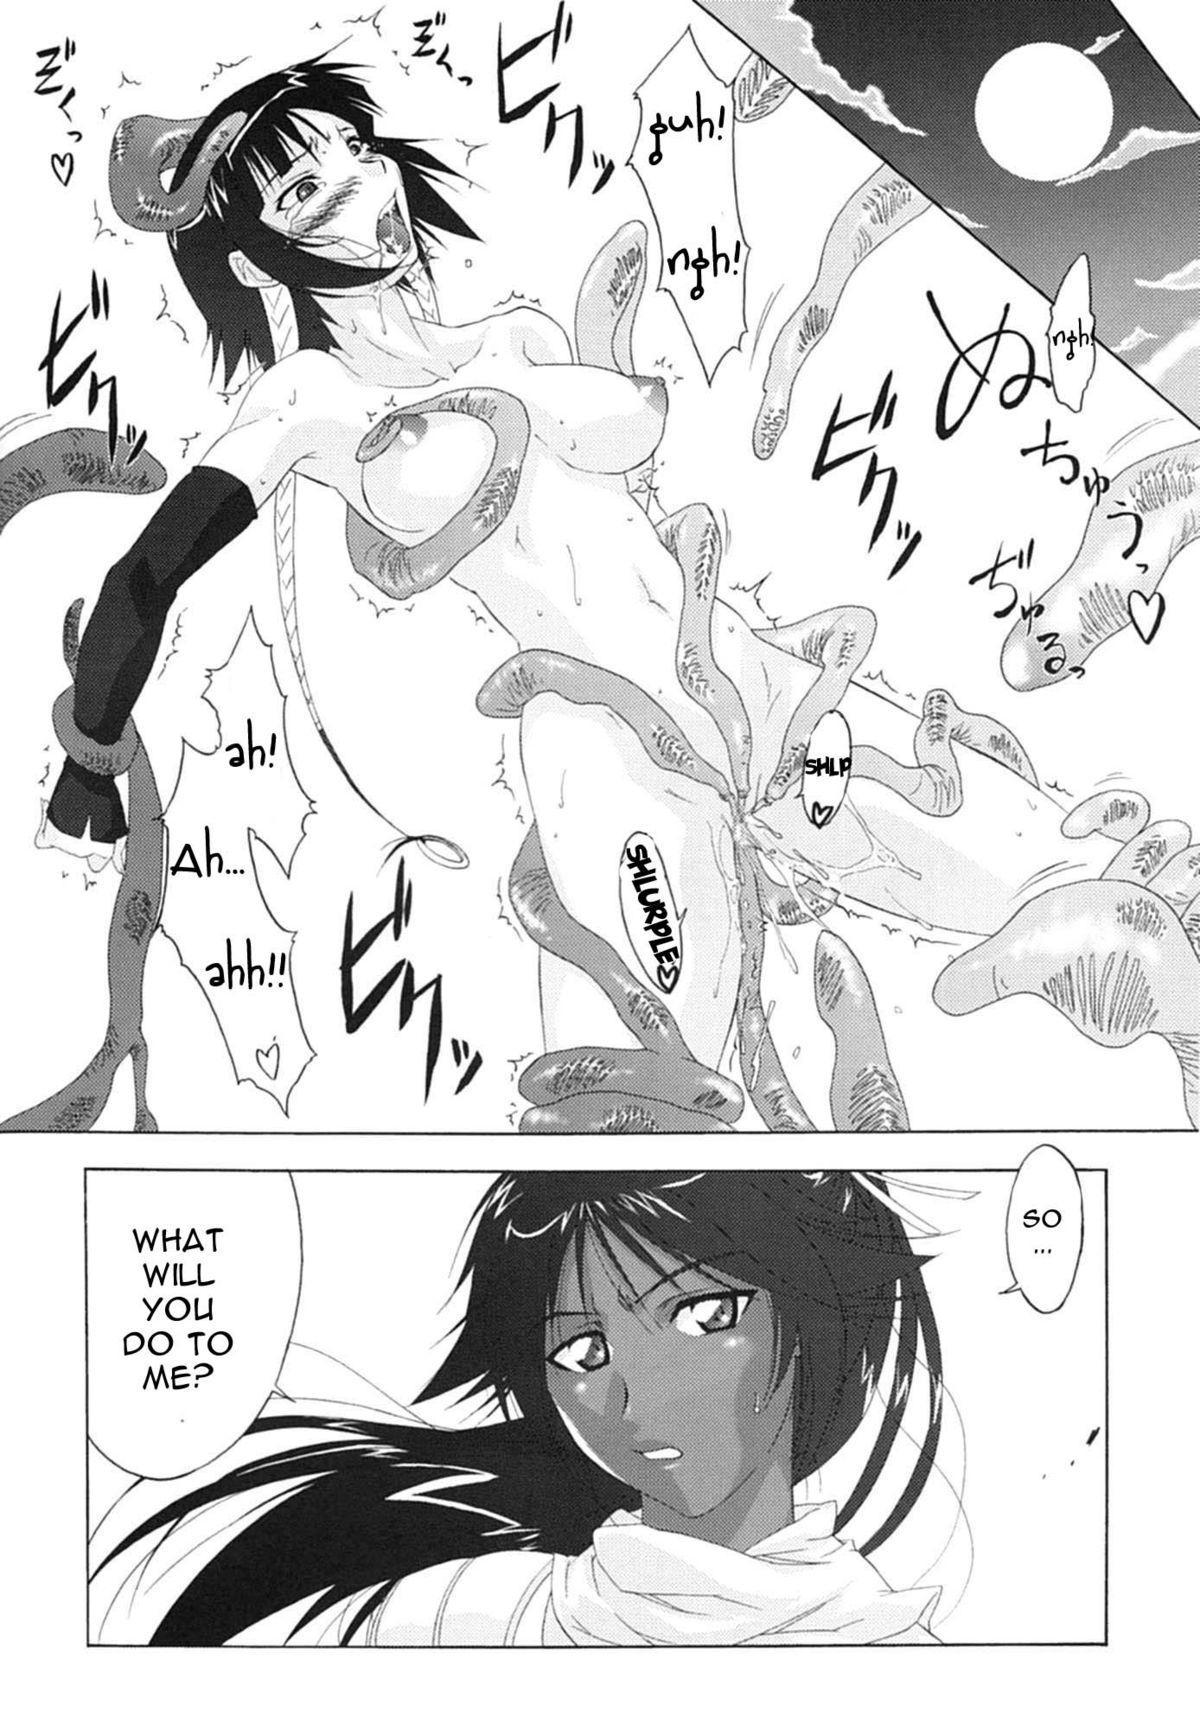 (C70) [Tsurikichi Doumei (Shiomi Yuusuke)] Cat-like Person, Bee-like Person (BLEACH) [English] 2